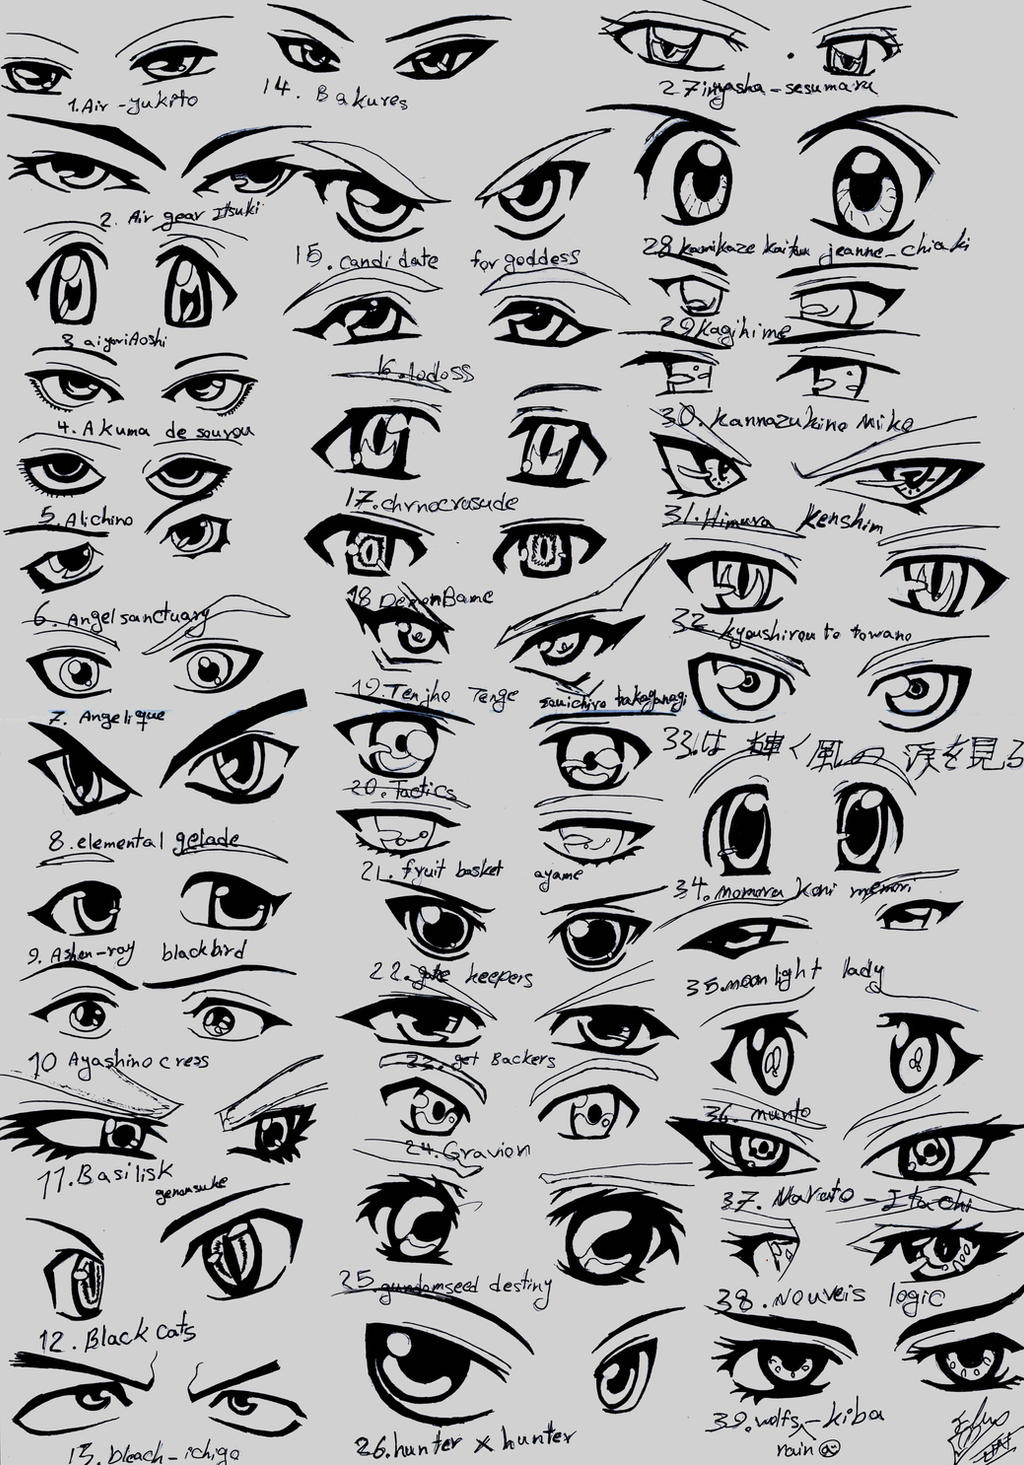 39 male anime eyes by eliantart